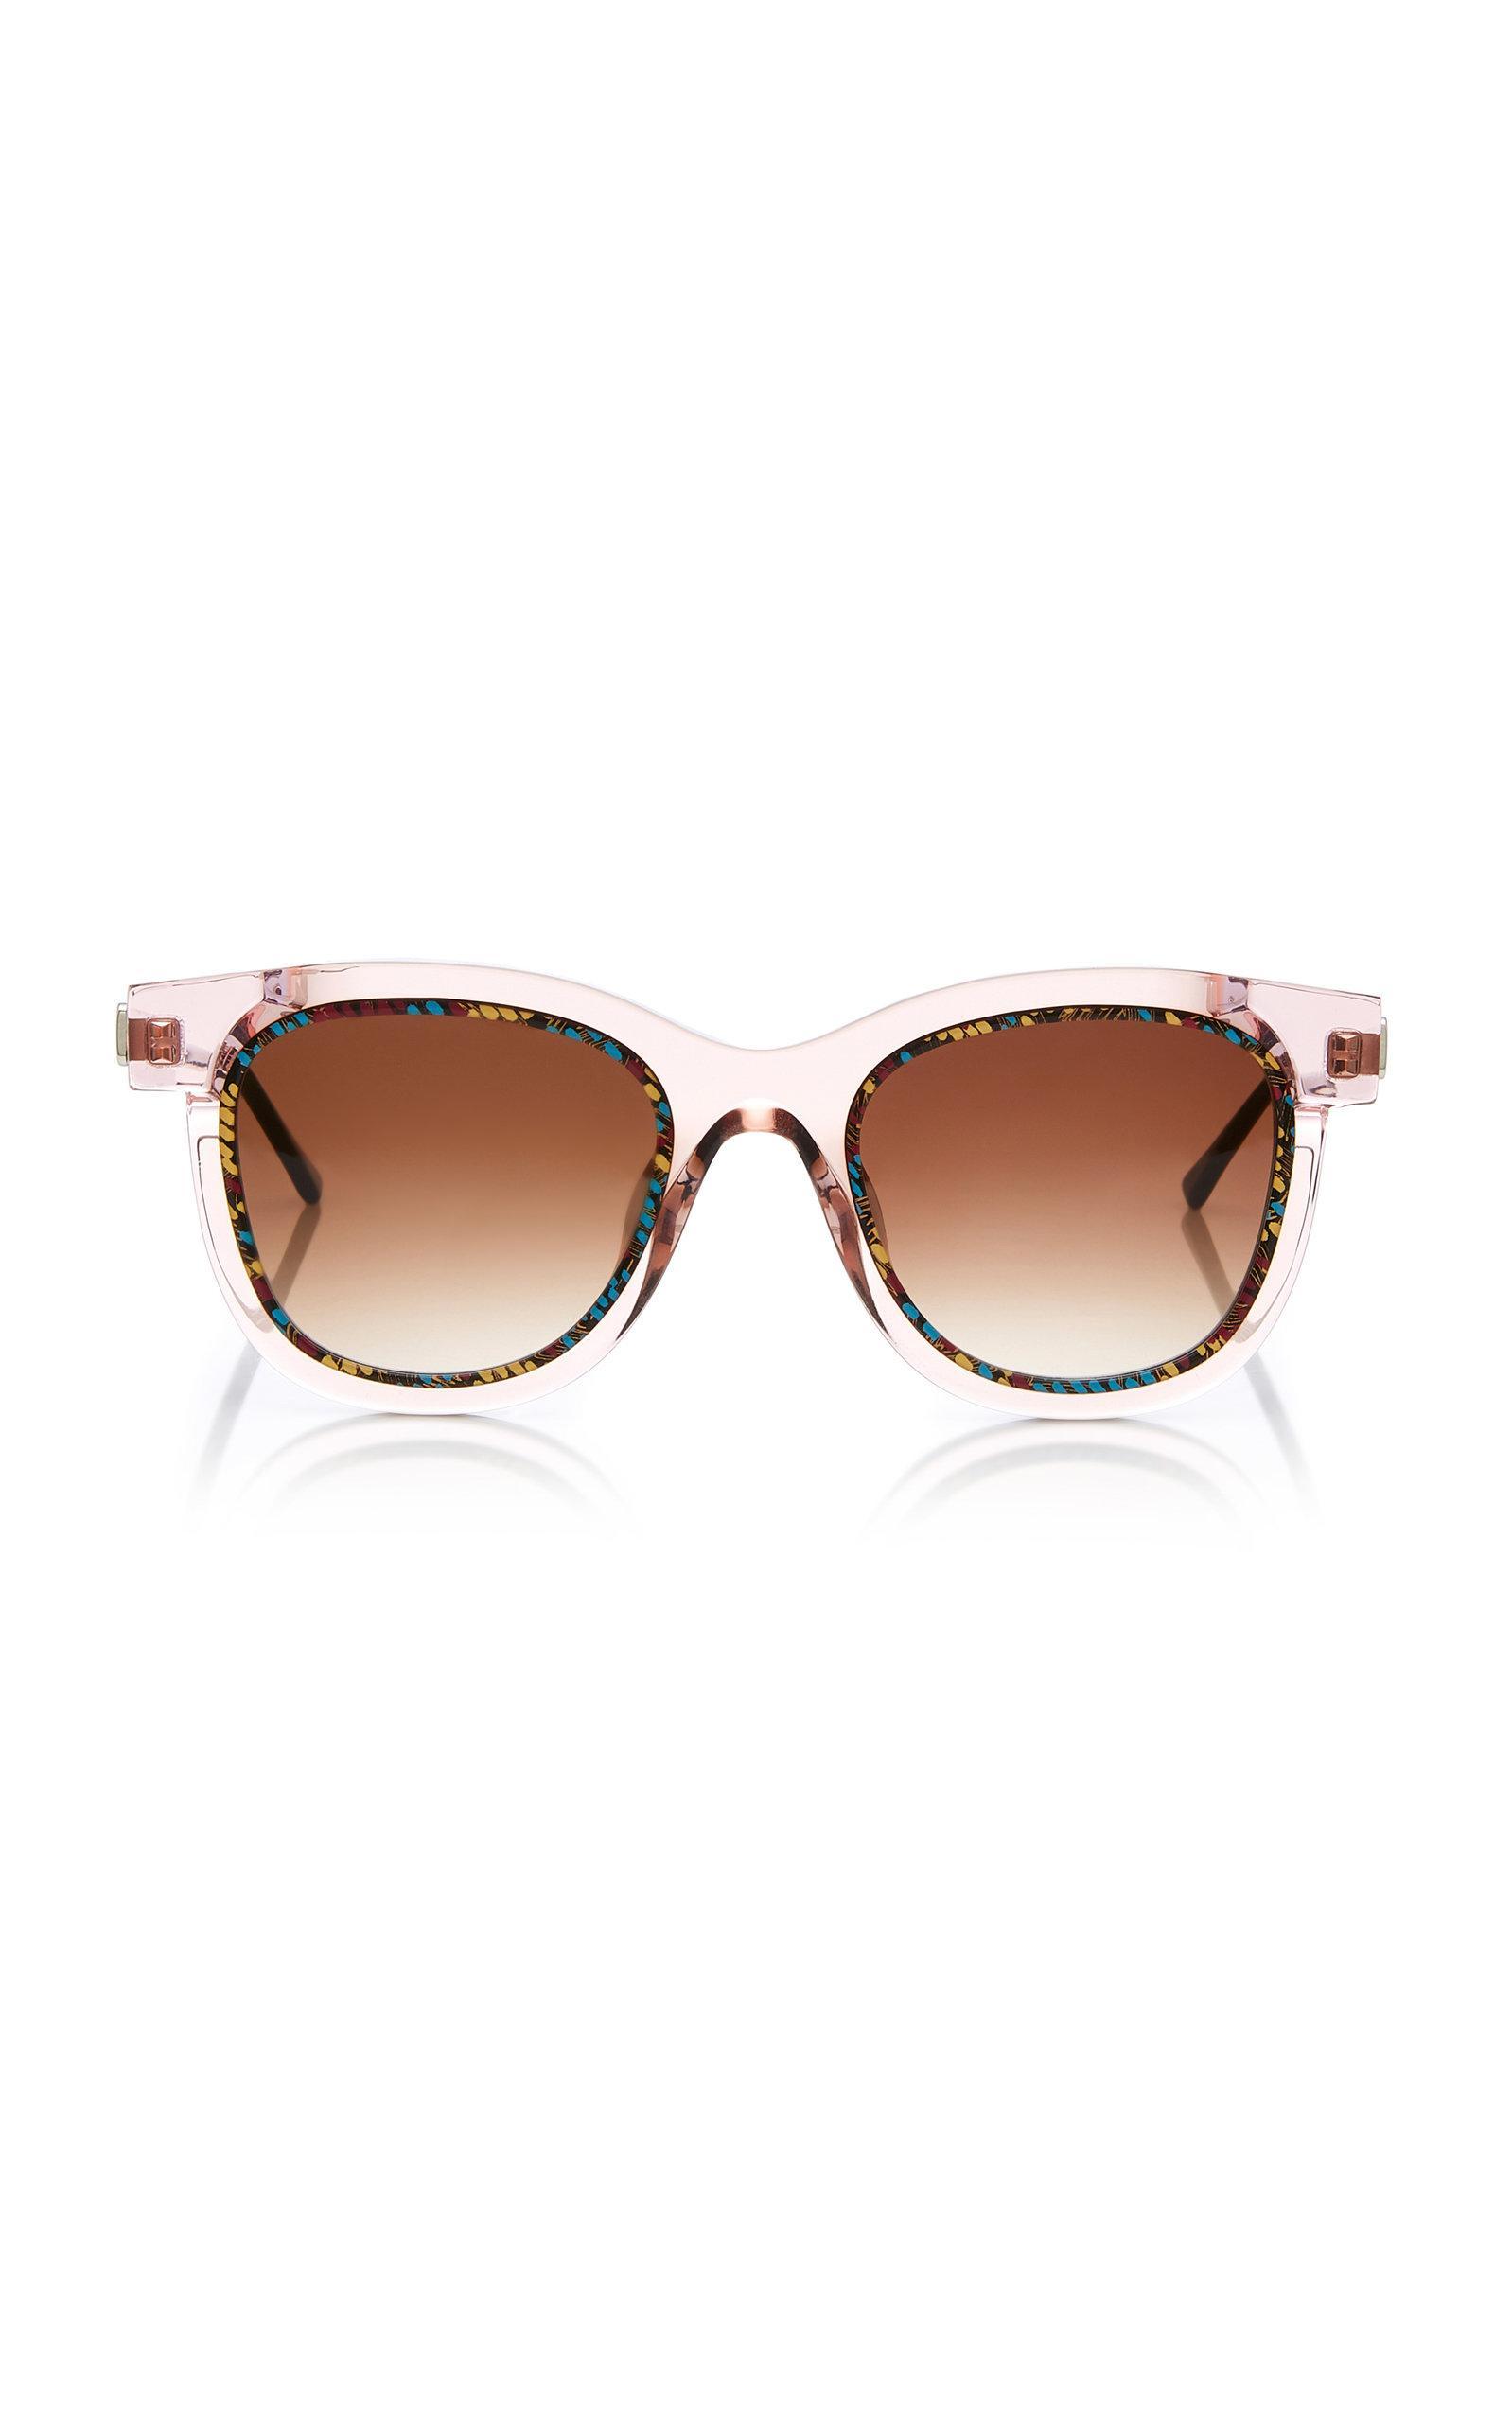 THIERRY LASRY Savvvy square sunglasses 6lBefUMGG